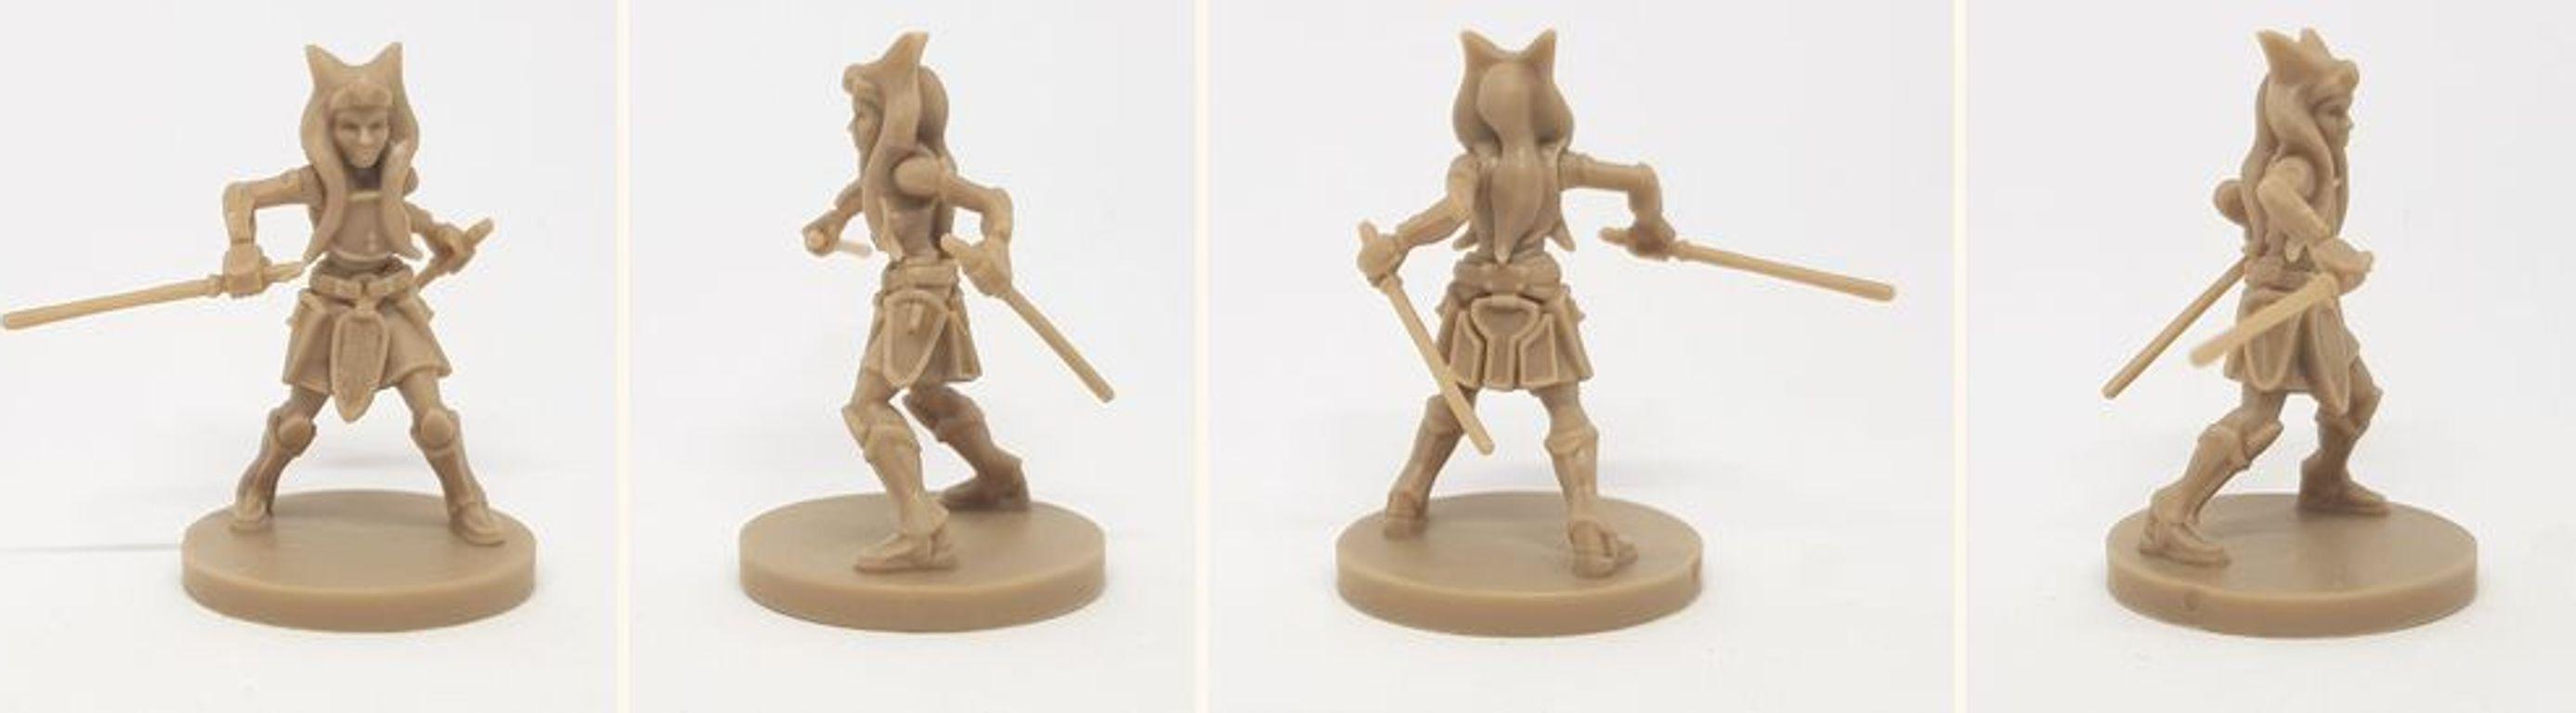 Star Wars: Imperial Assault - Ahsoka Tano Ally Pack miniatures